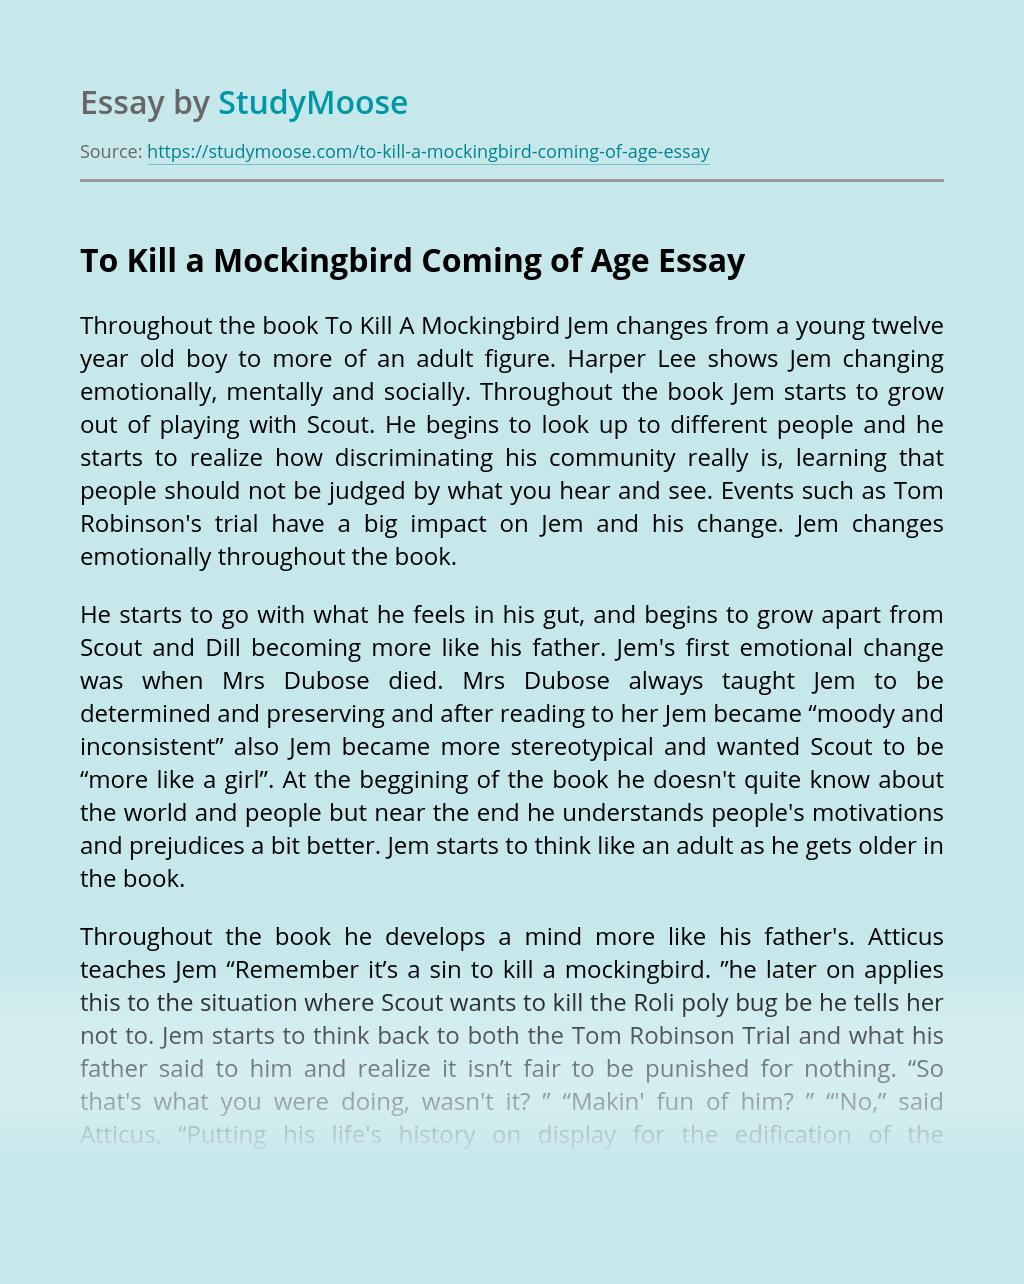 To Kill a Mockingbird Coming of Age